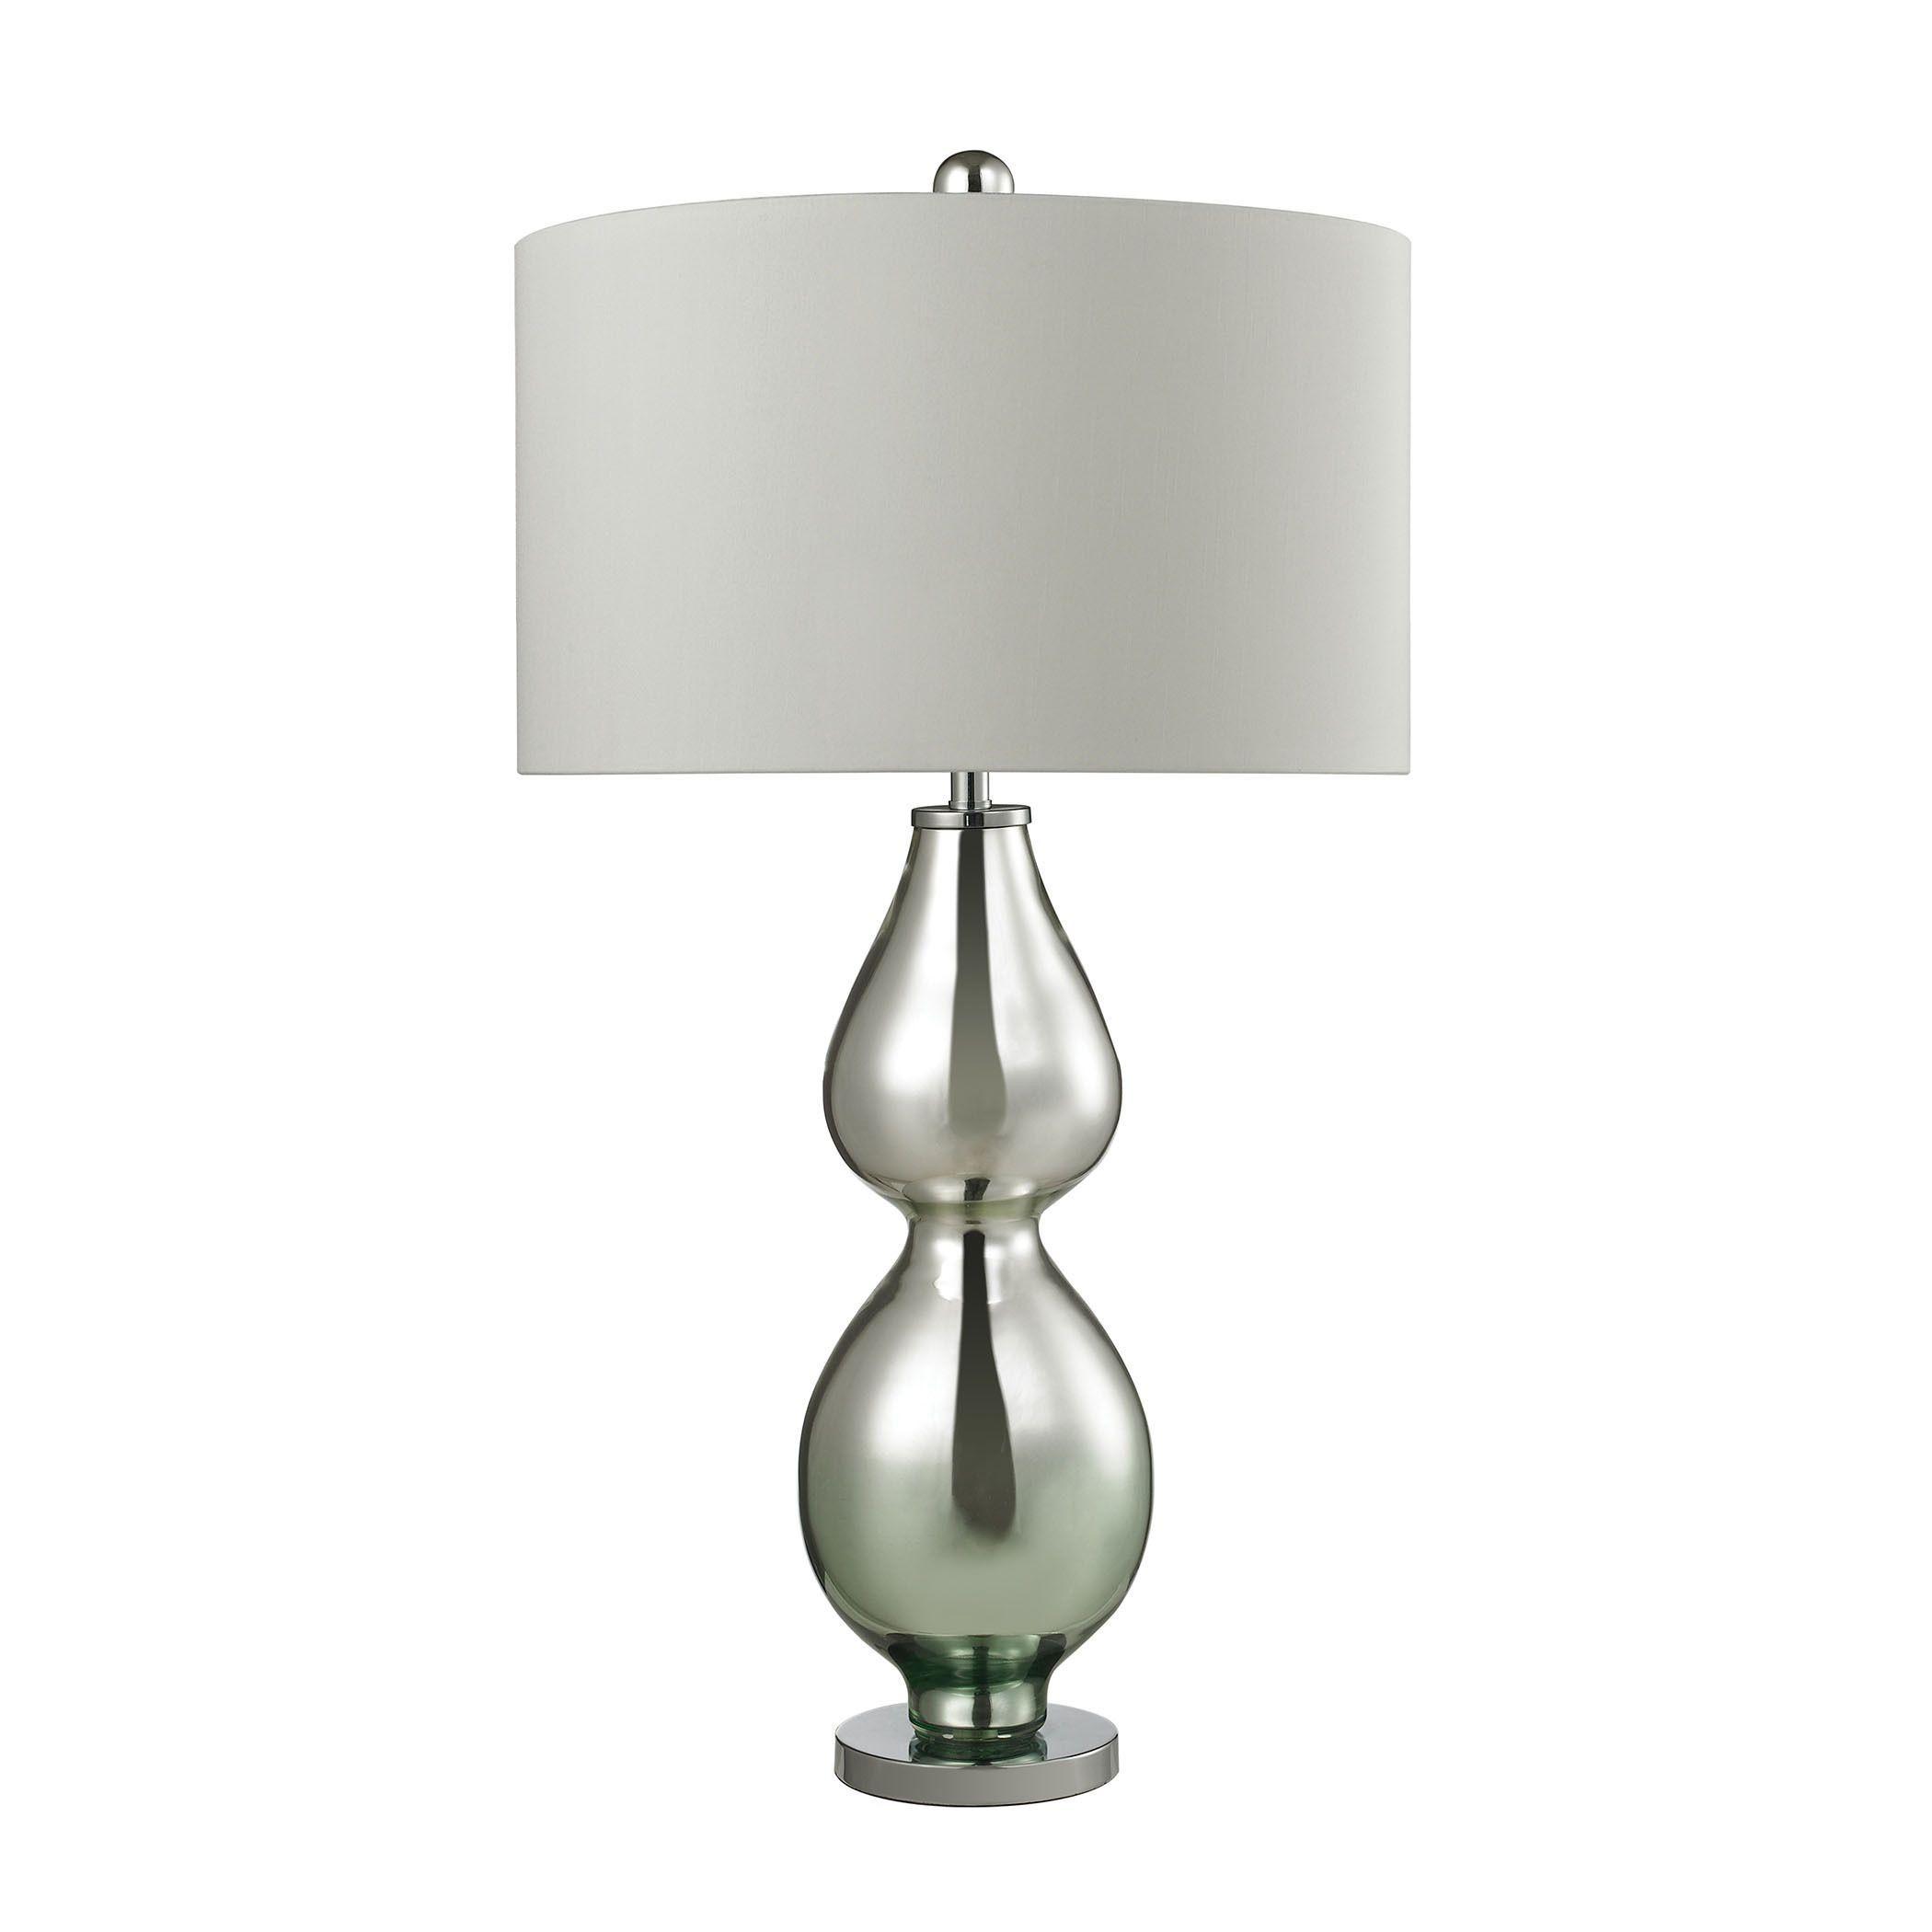 Dimond Double Gourd Light Green Mercury Table Lamp 150 W Med Bulb